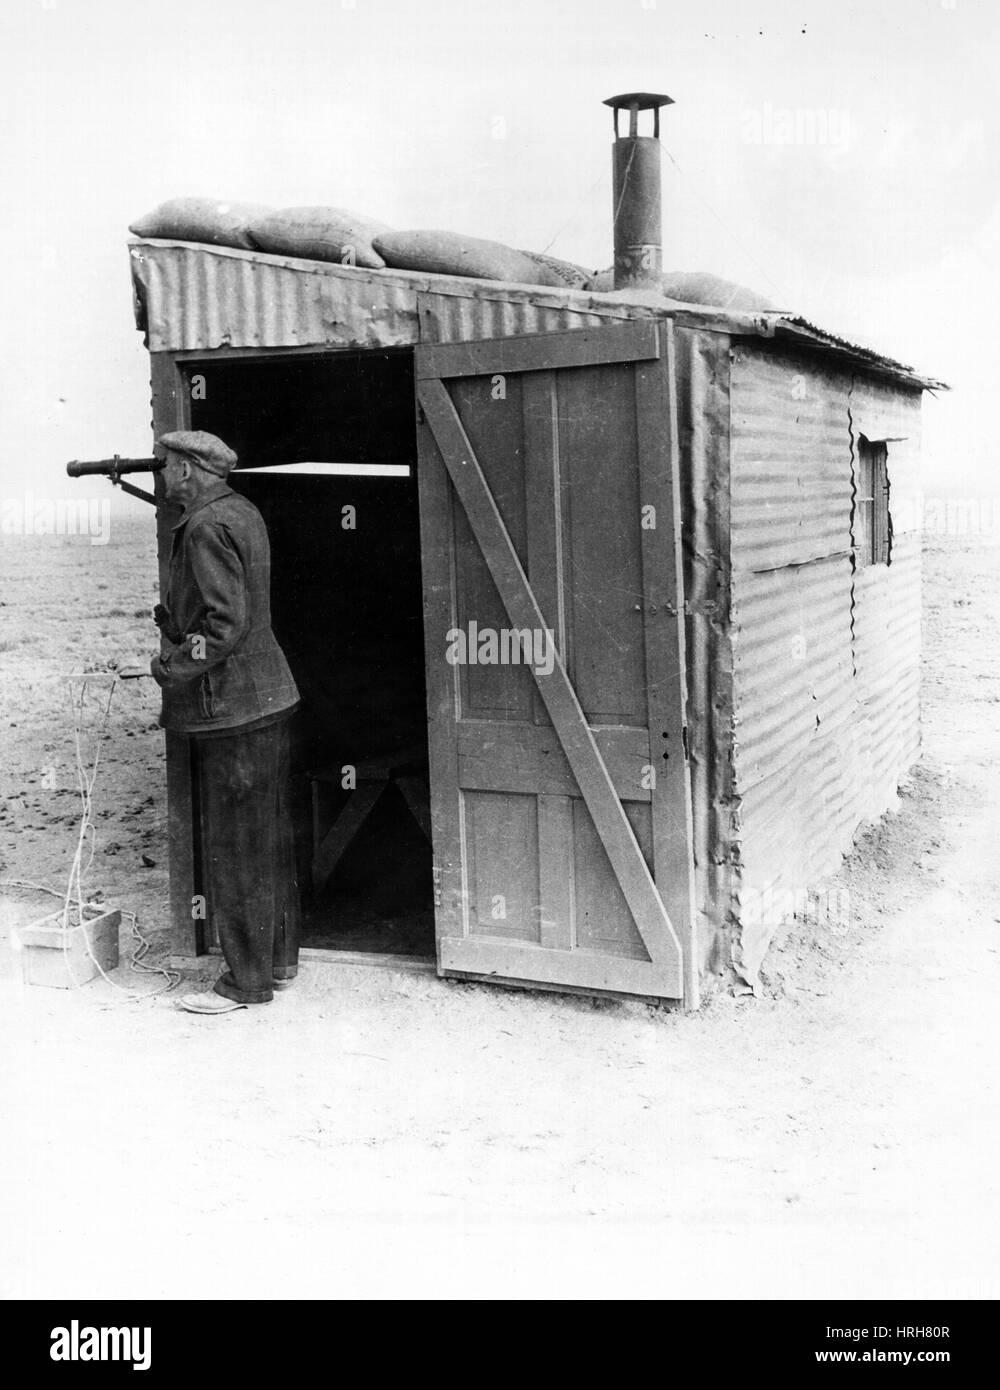 Robert Goddard, US-amerikanischer Wissenschaftler Stockfoto